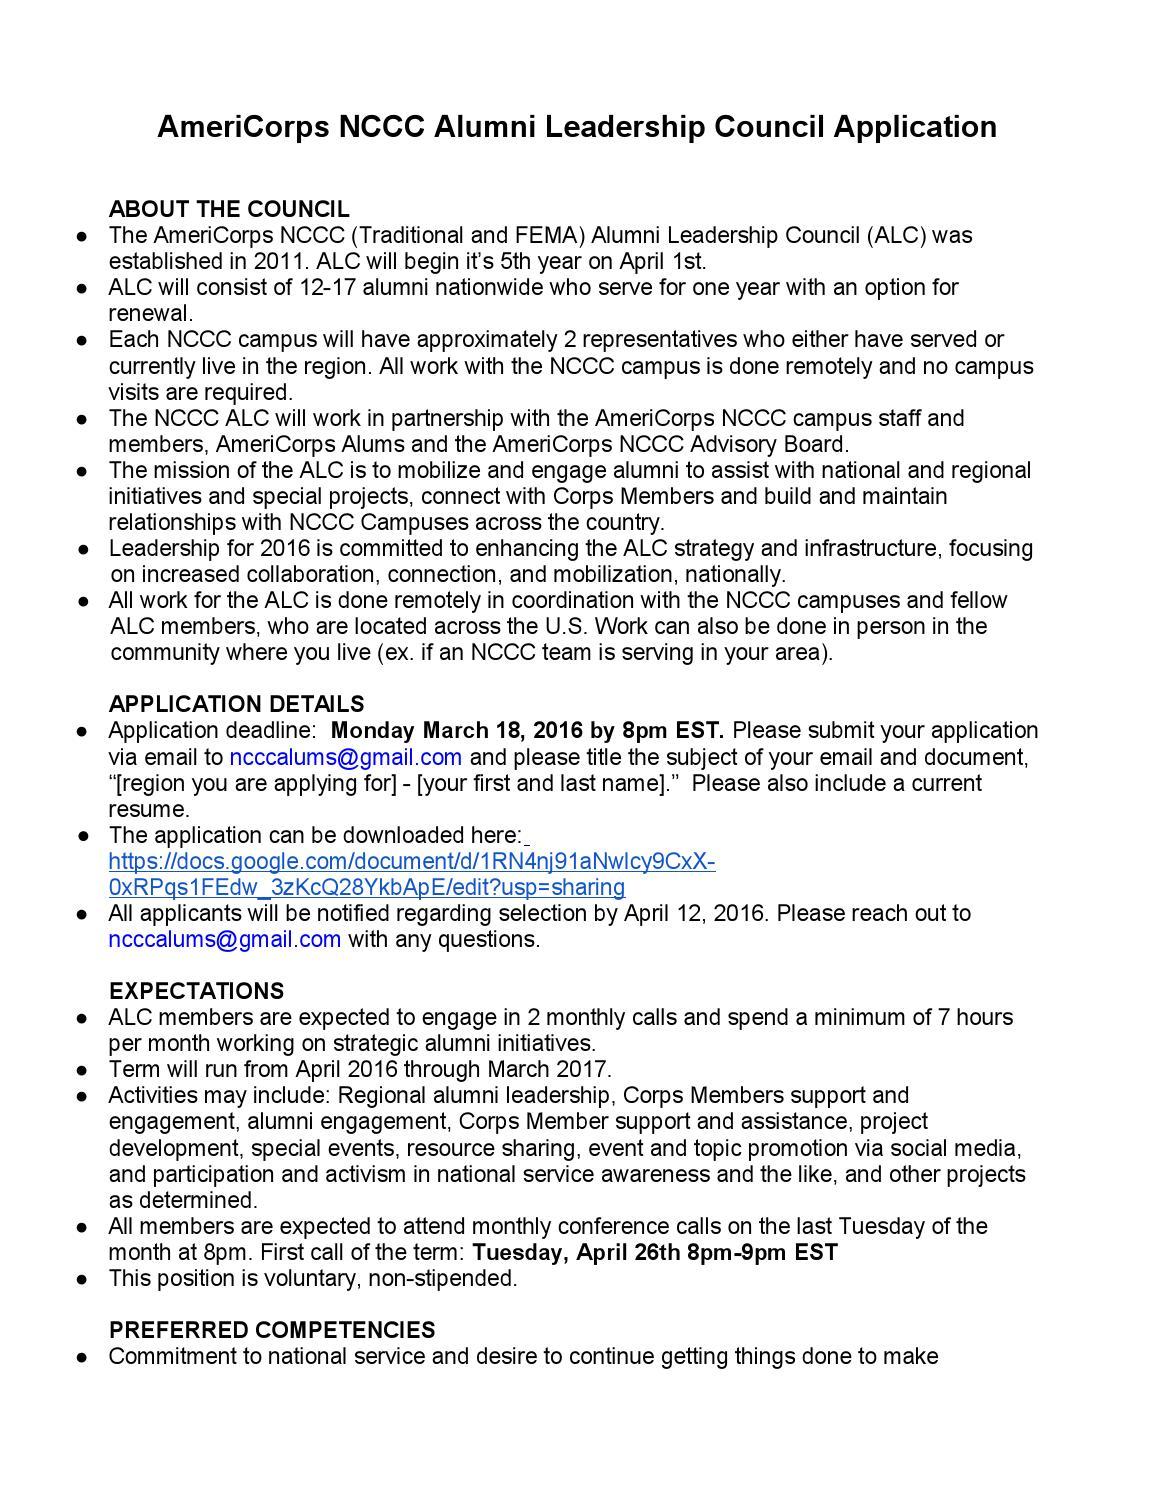 americorp application essay